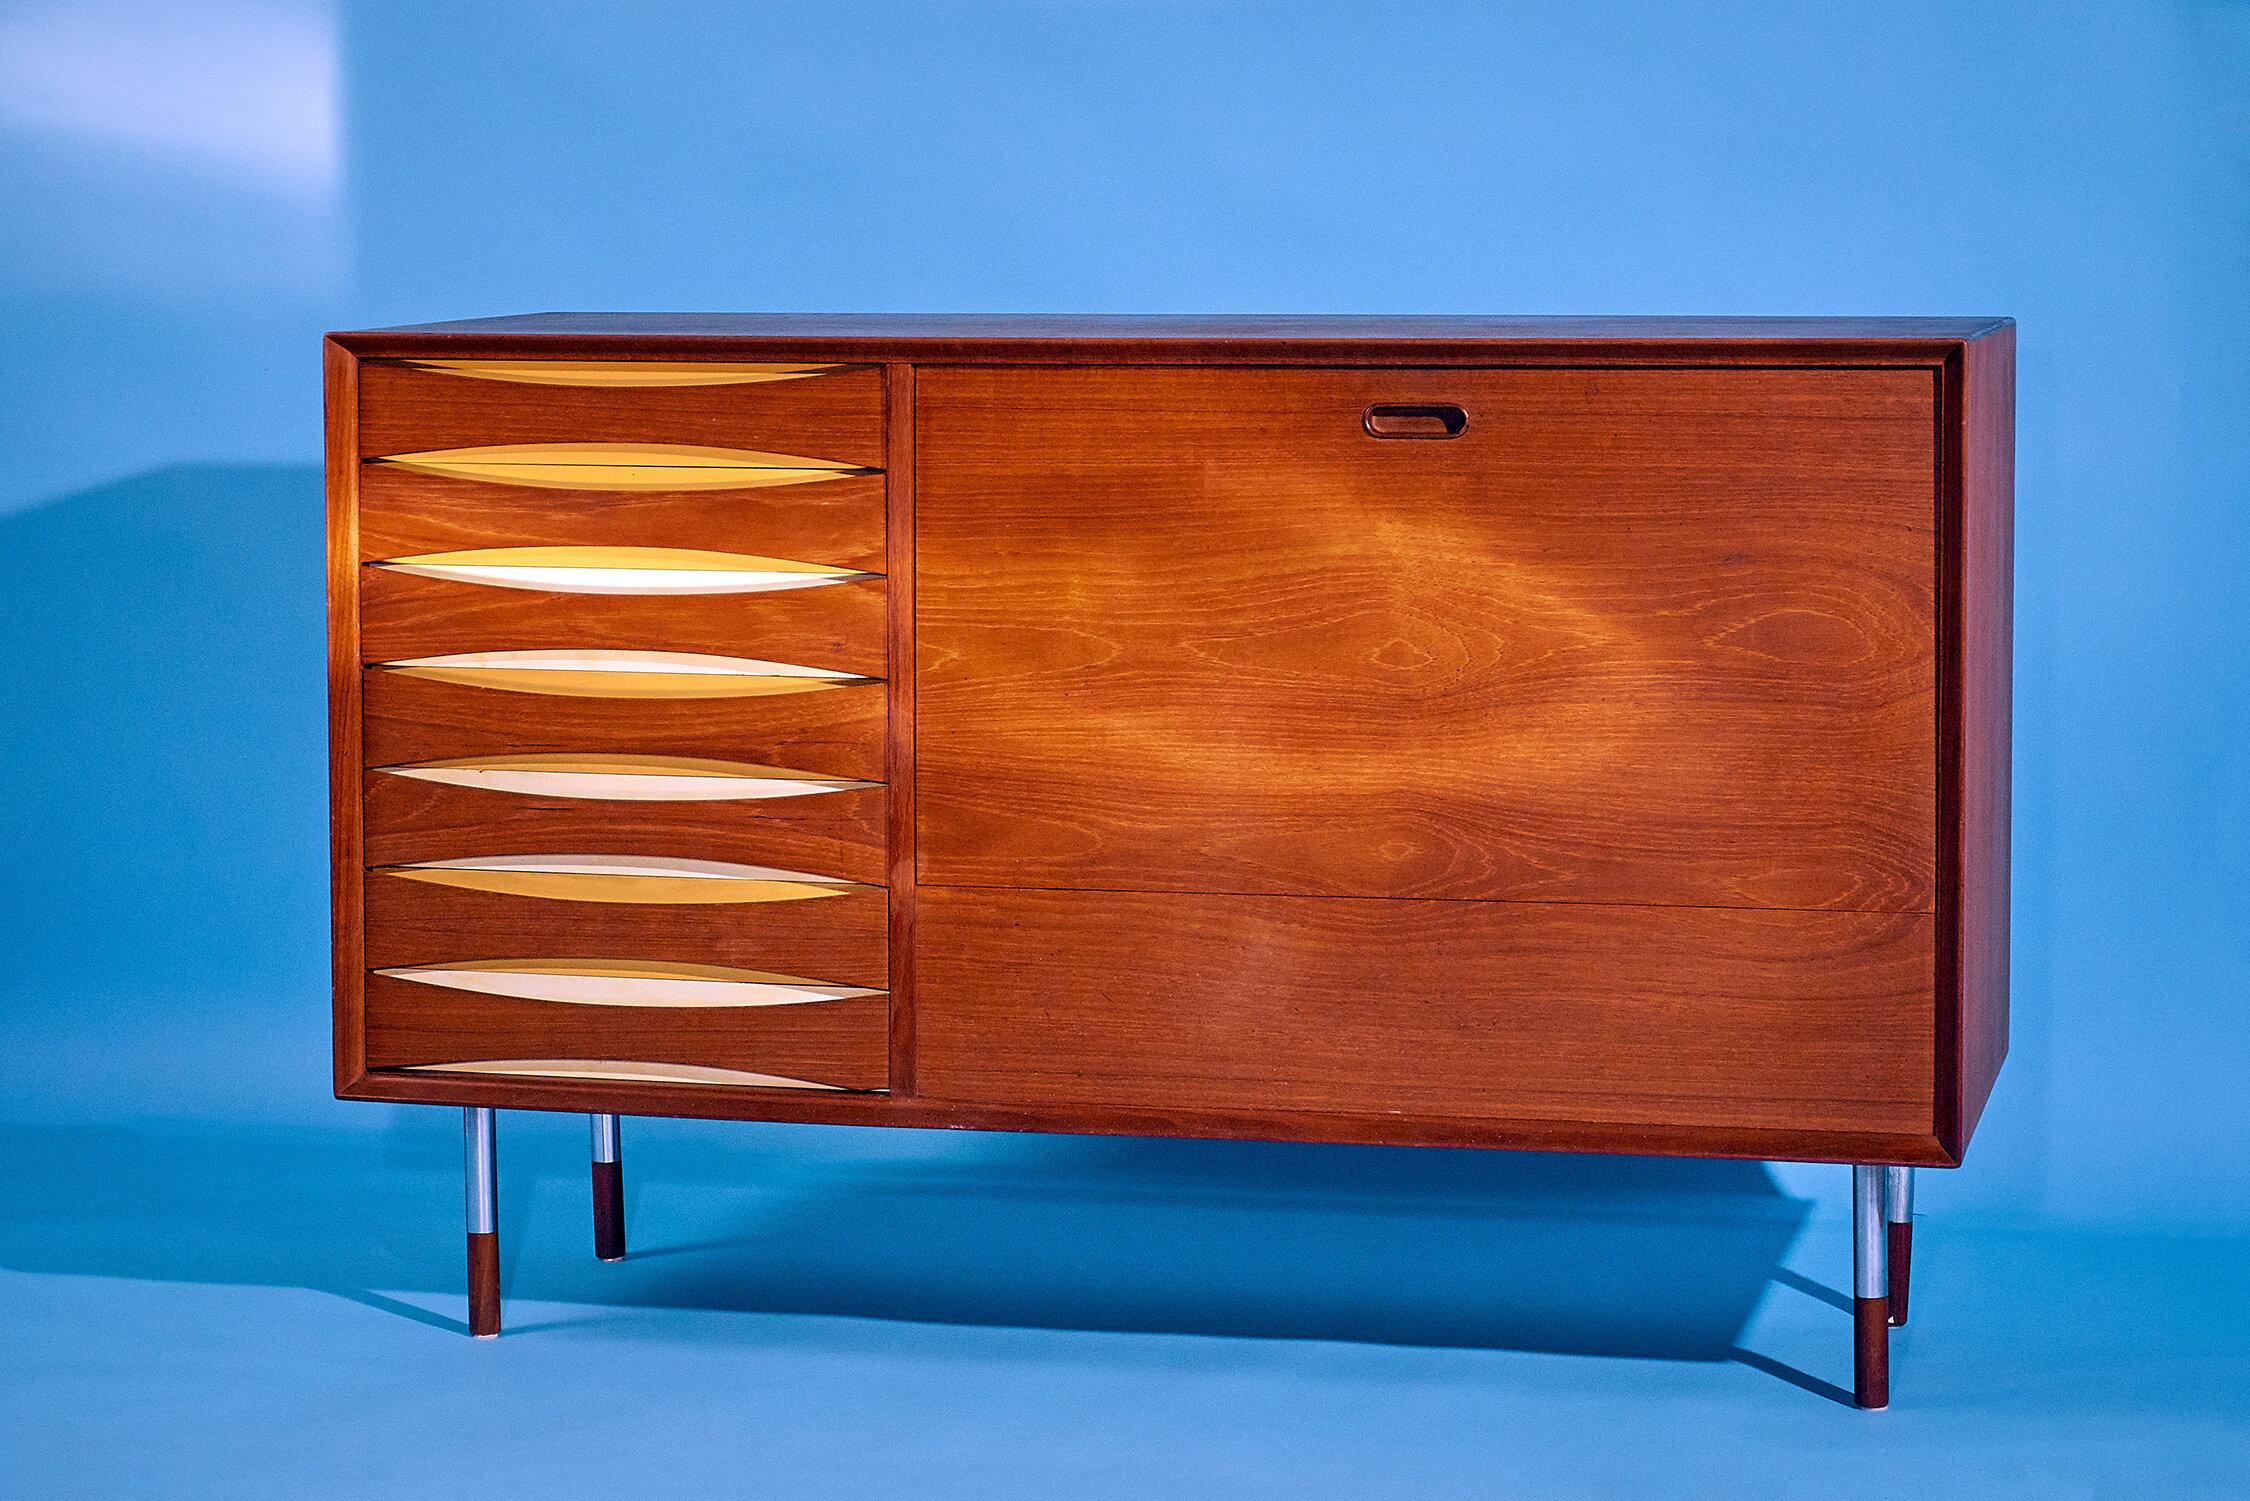 Arne Vodder Sideboard The Space Detroit 1.jpg